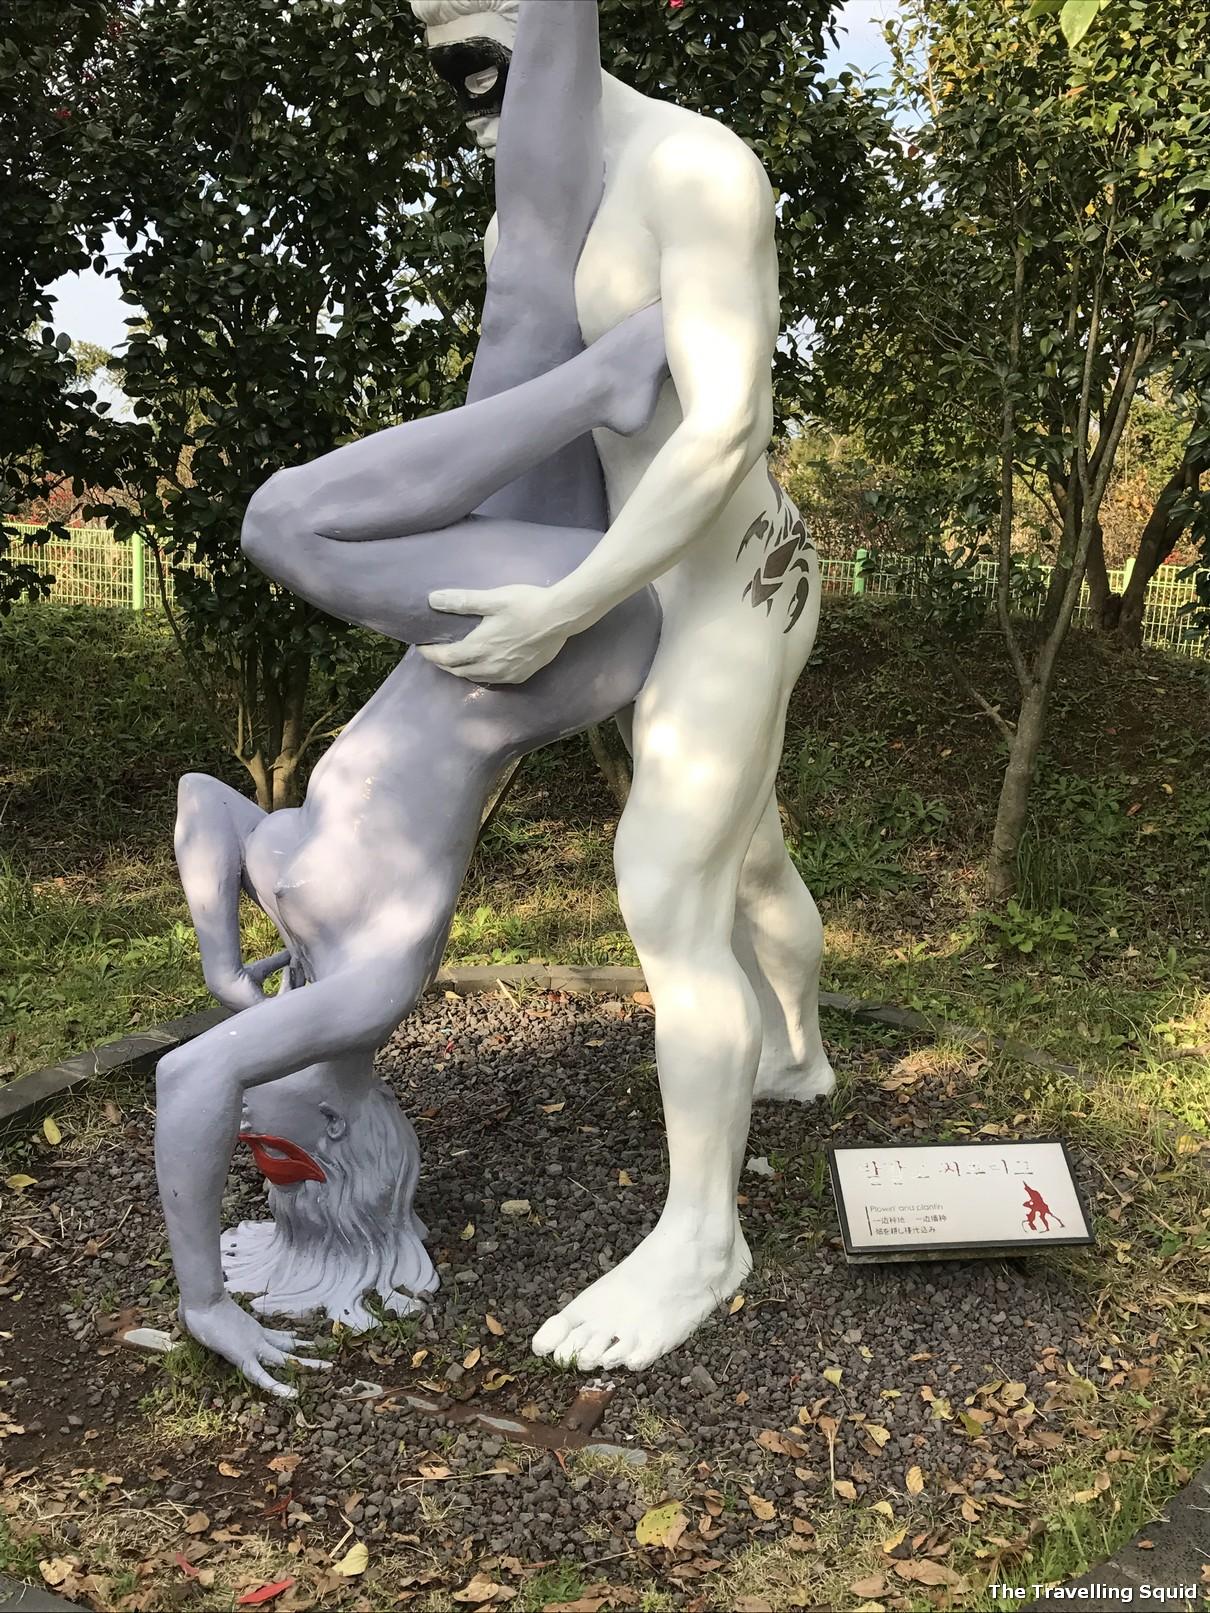 jeju loveland sex sculptures